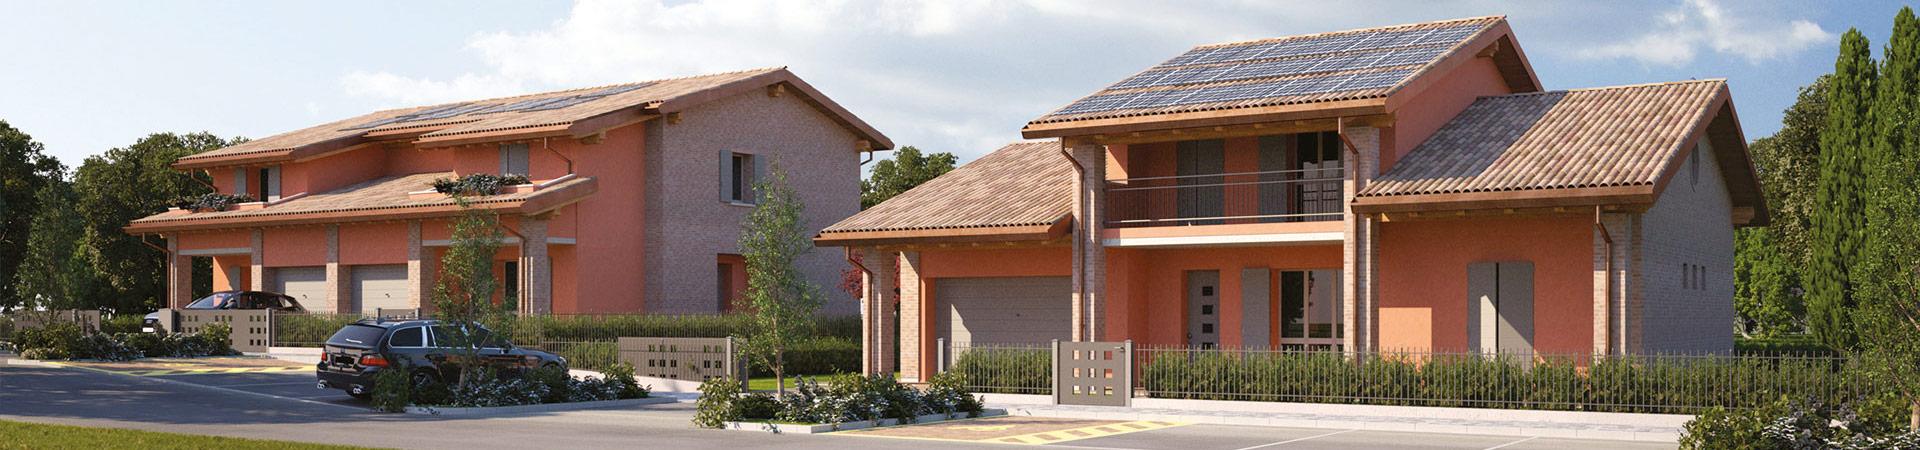 casa fotovoltaico impianto